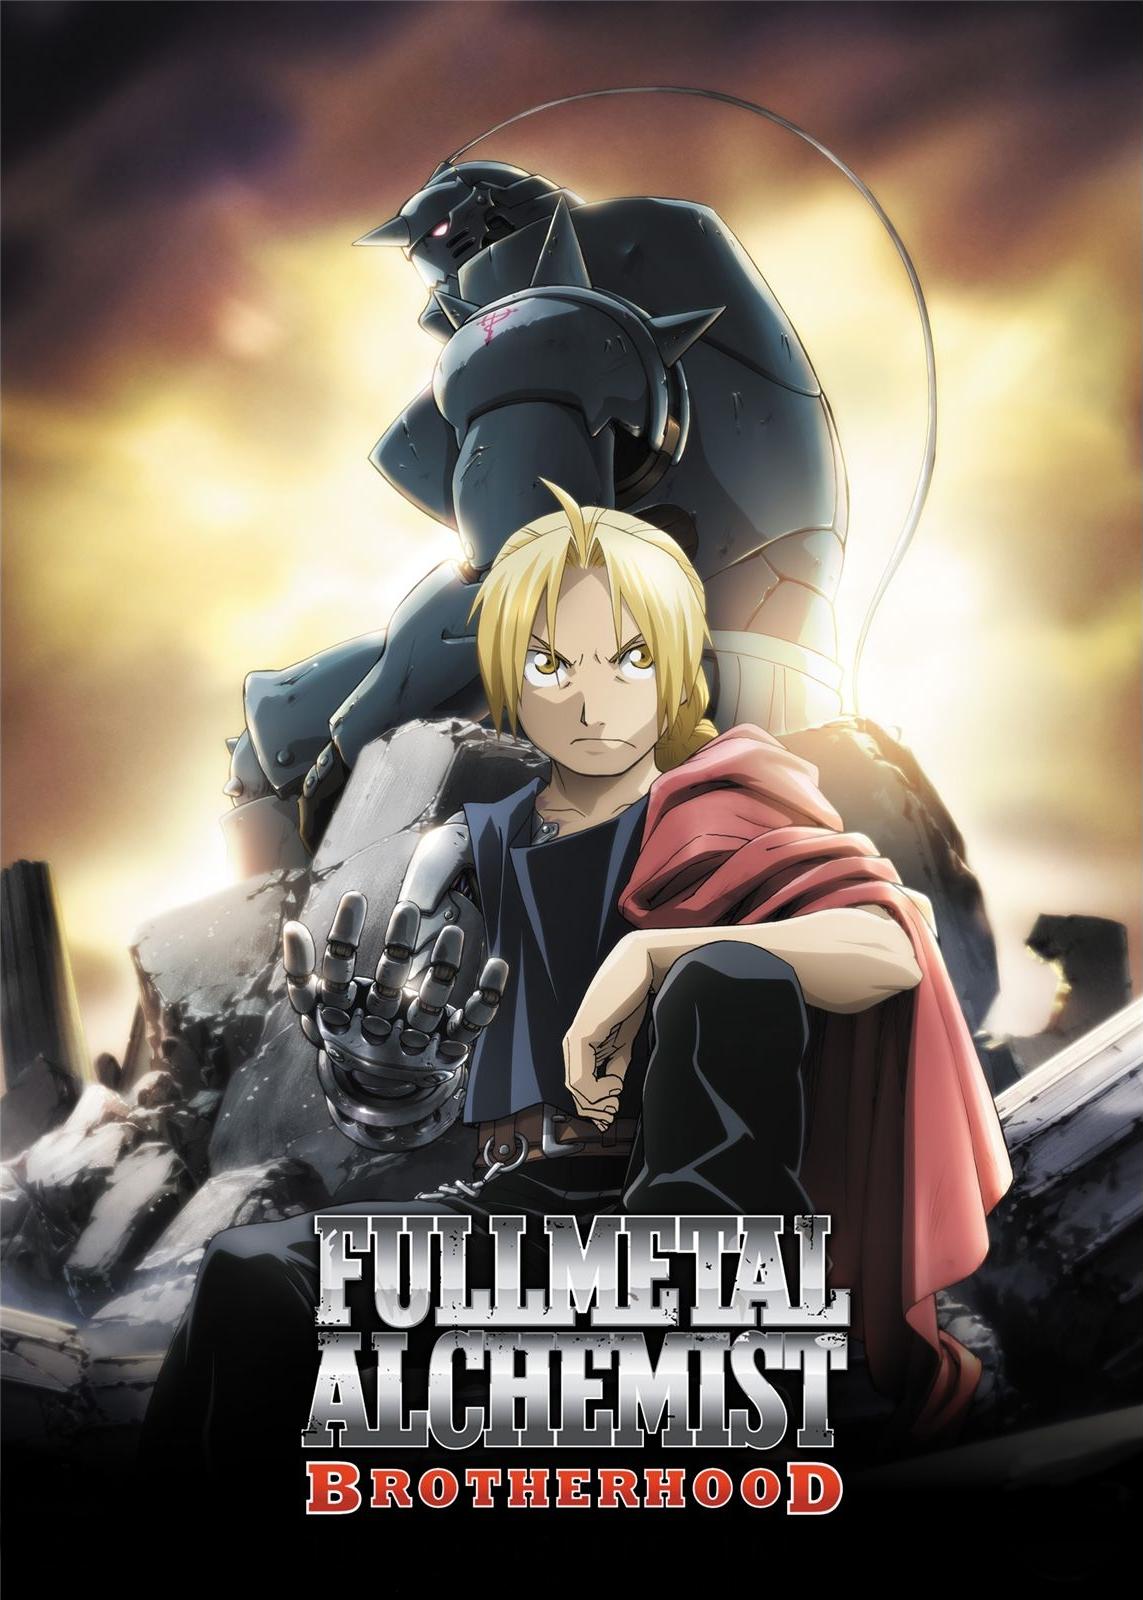 Fullmetal Alchemist Brotherhood - Full HD 1080p